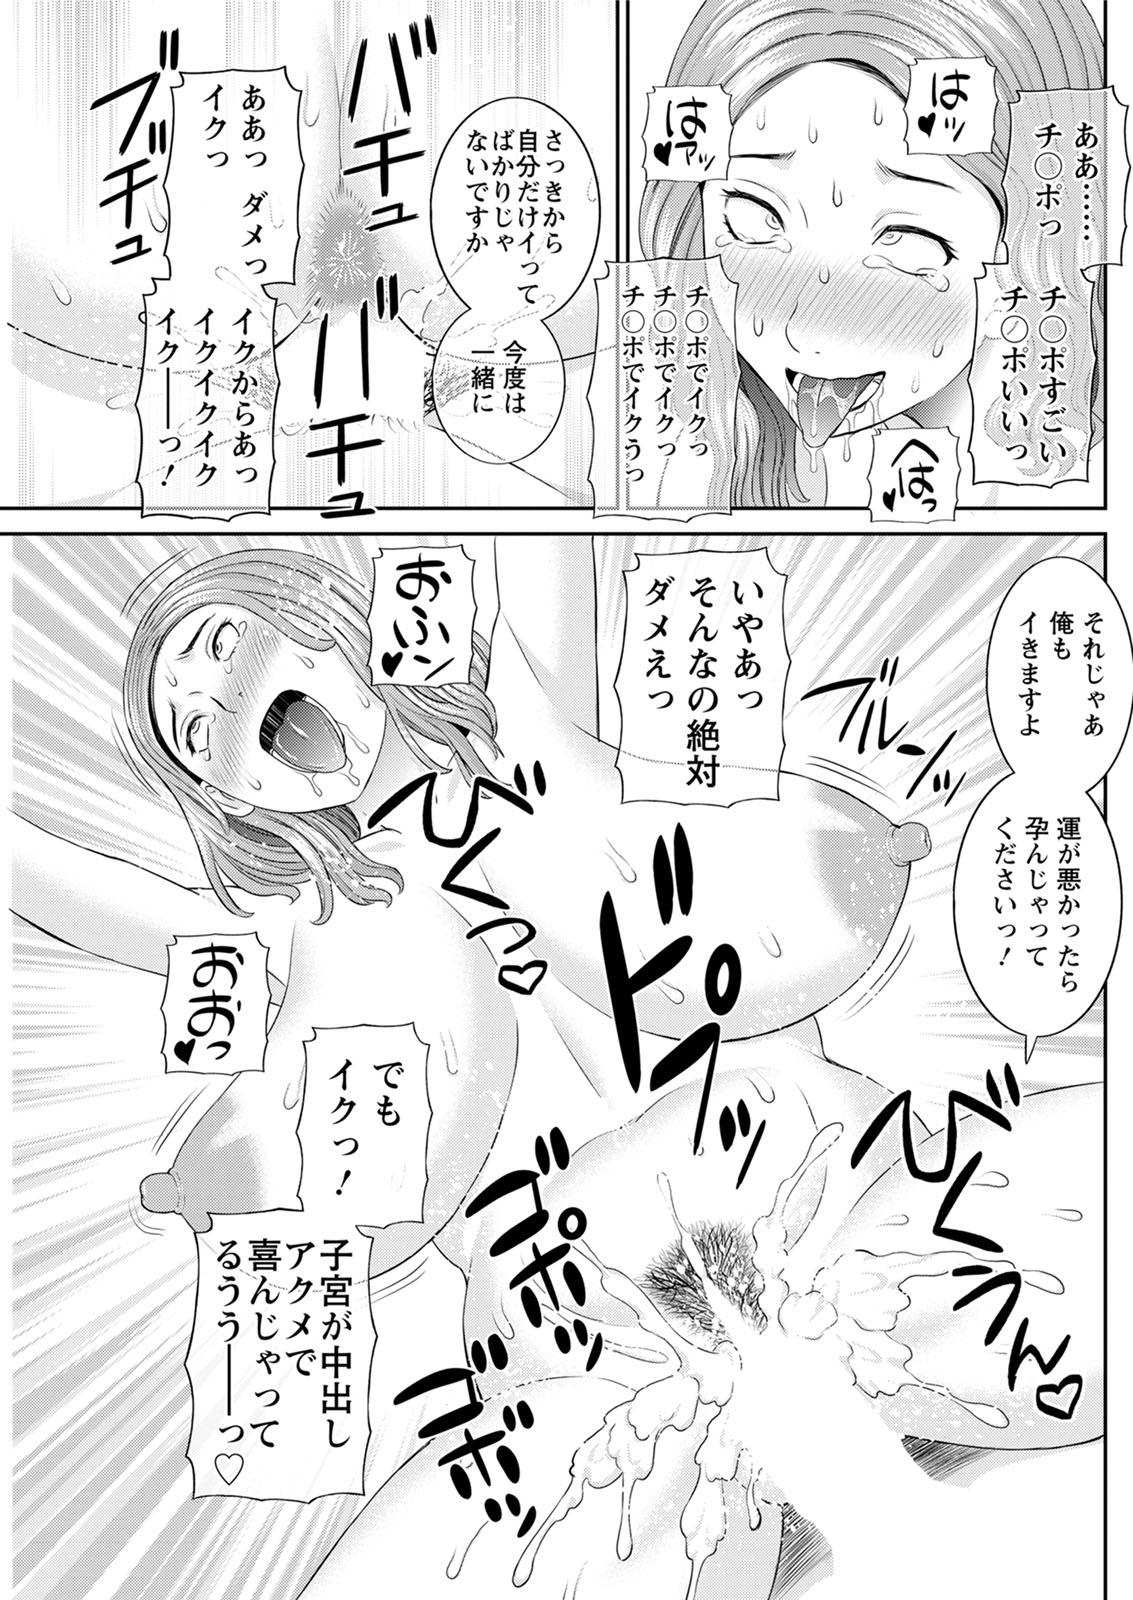 [Kawamori Misaki] Kaikan Hitotsuma Gakuen Ch. 1-6, 8-20 [Digital] 237